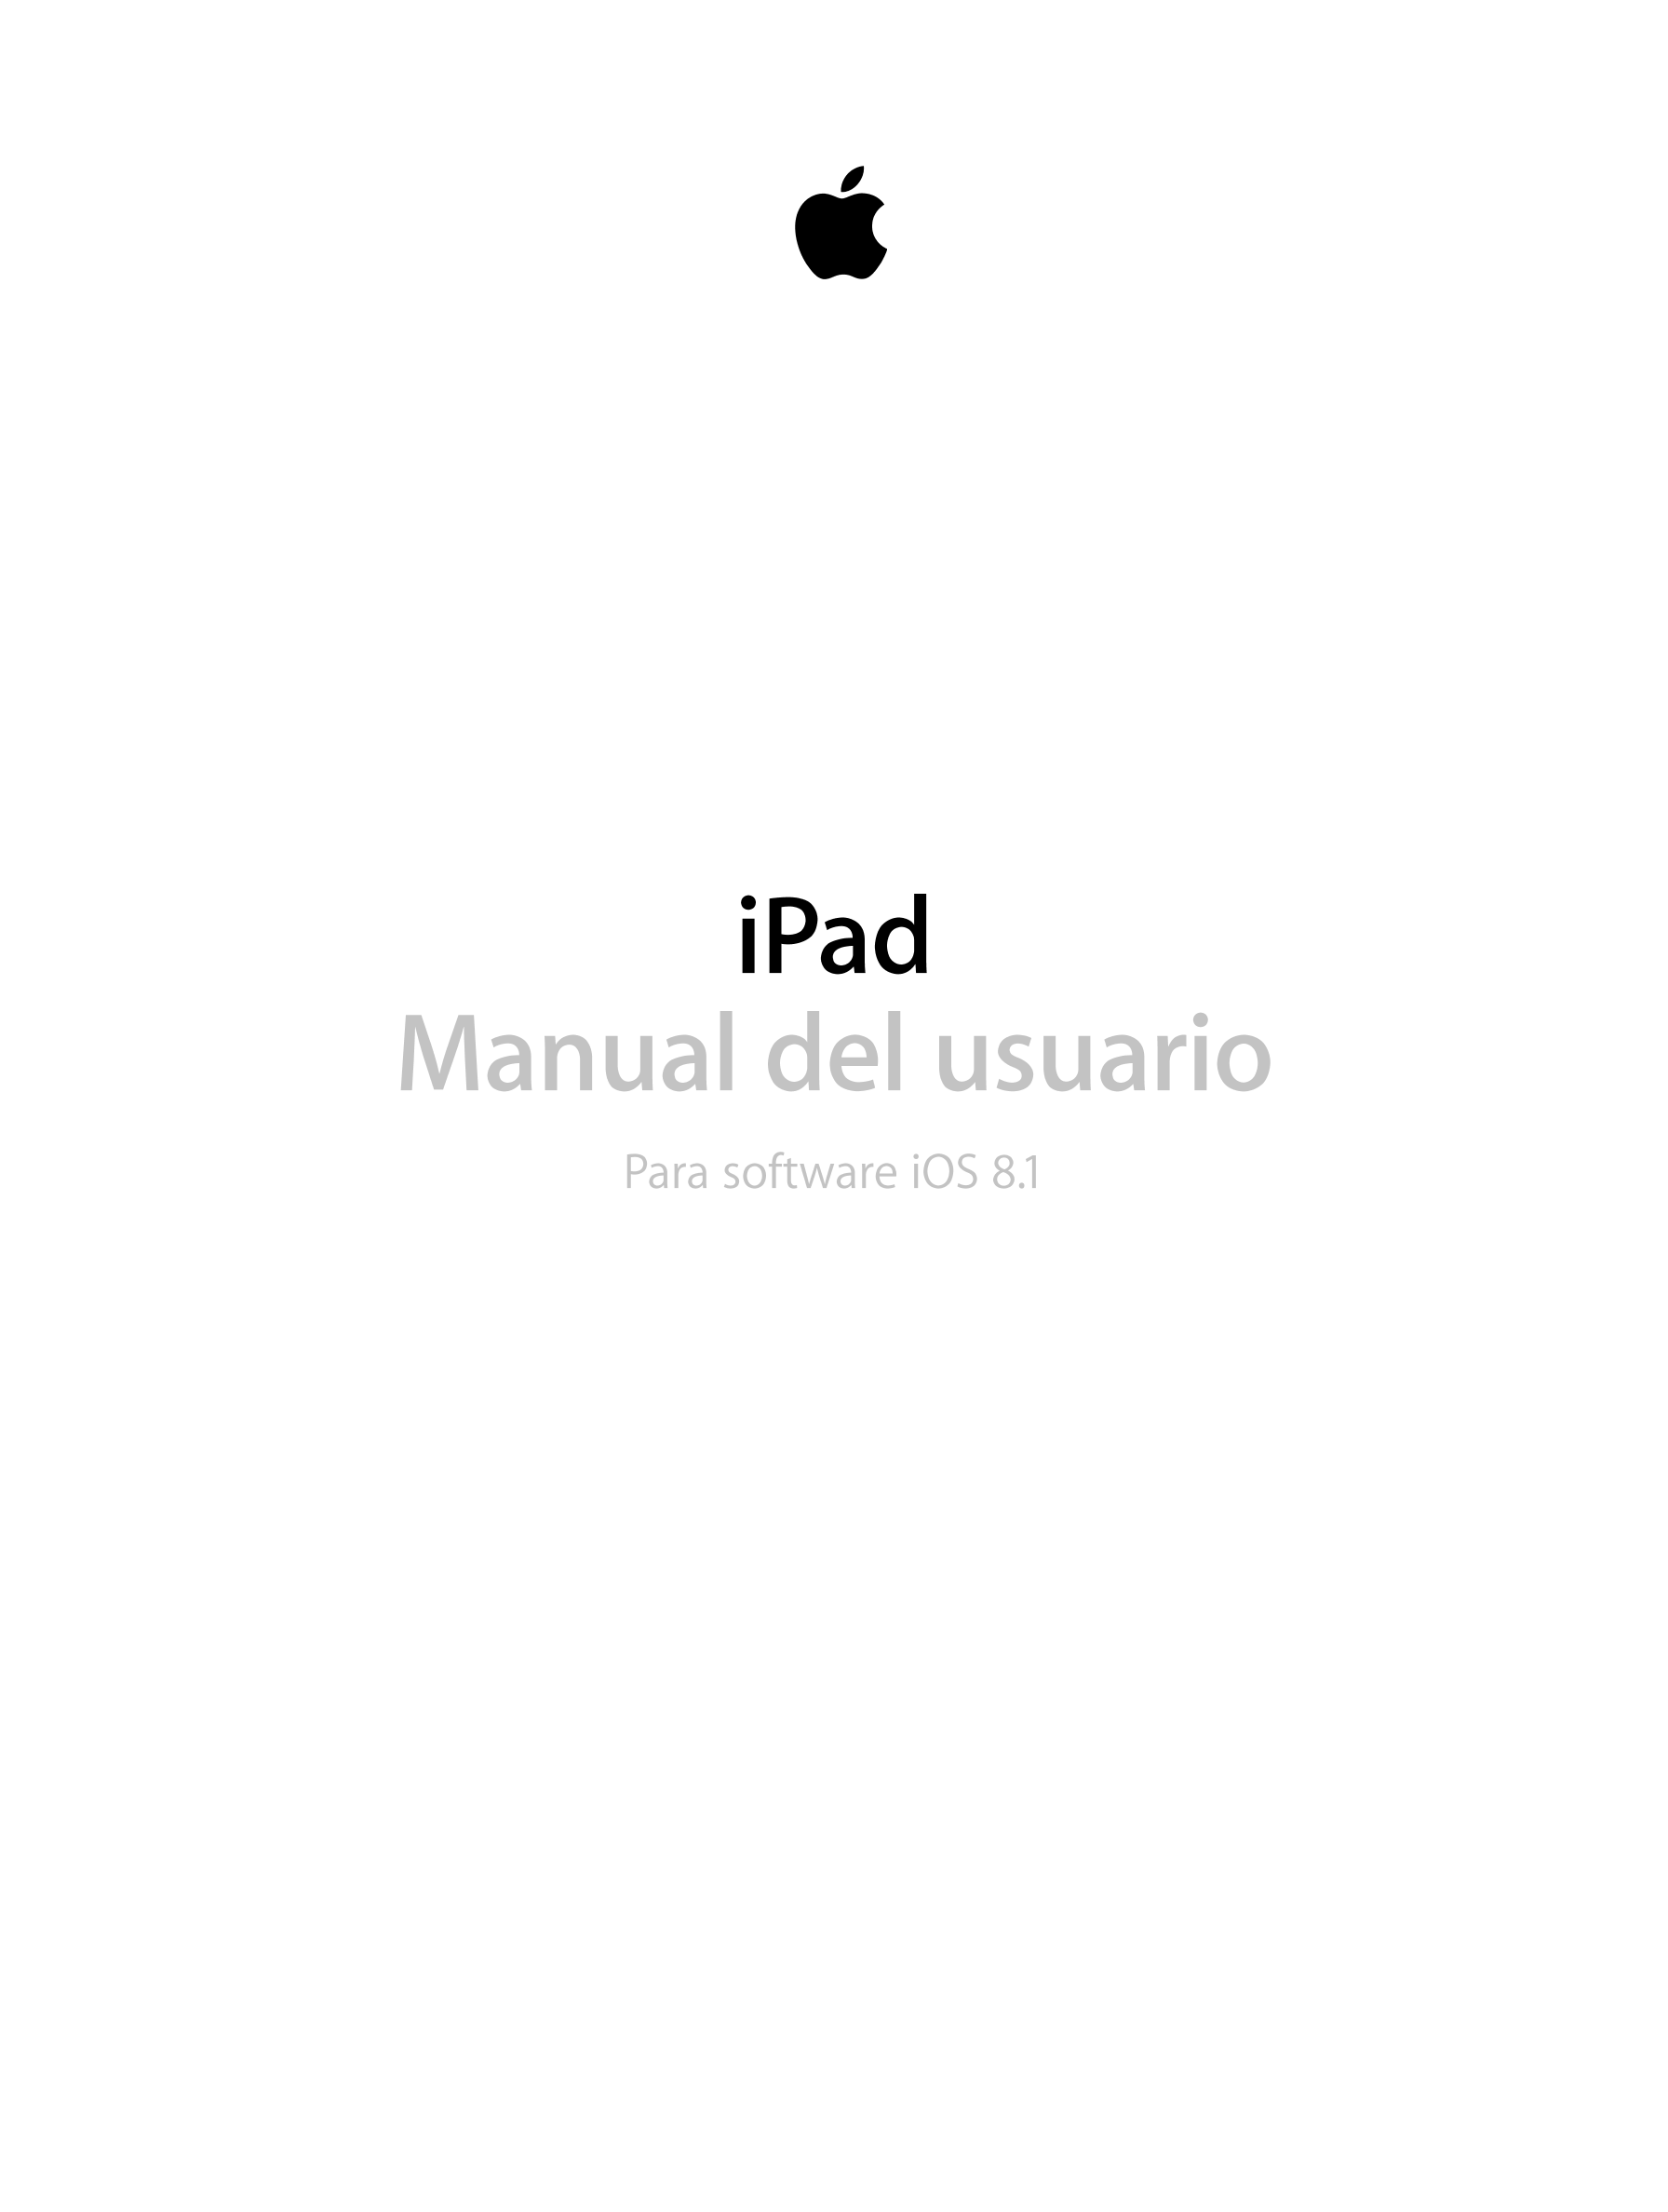 manual apple ipad 3 ios 8 device guides rh helpforsmartphone com Manual Del iPhone 5 Panasonic TC 55Le54 Manual